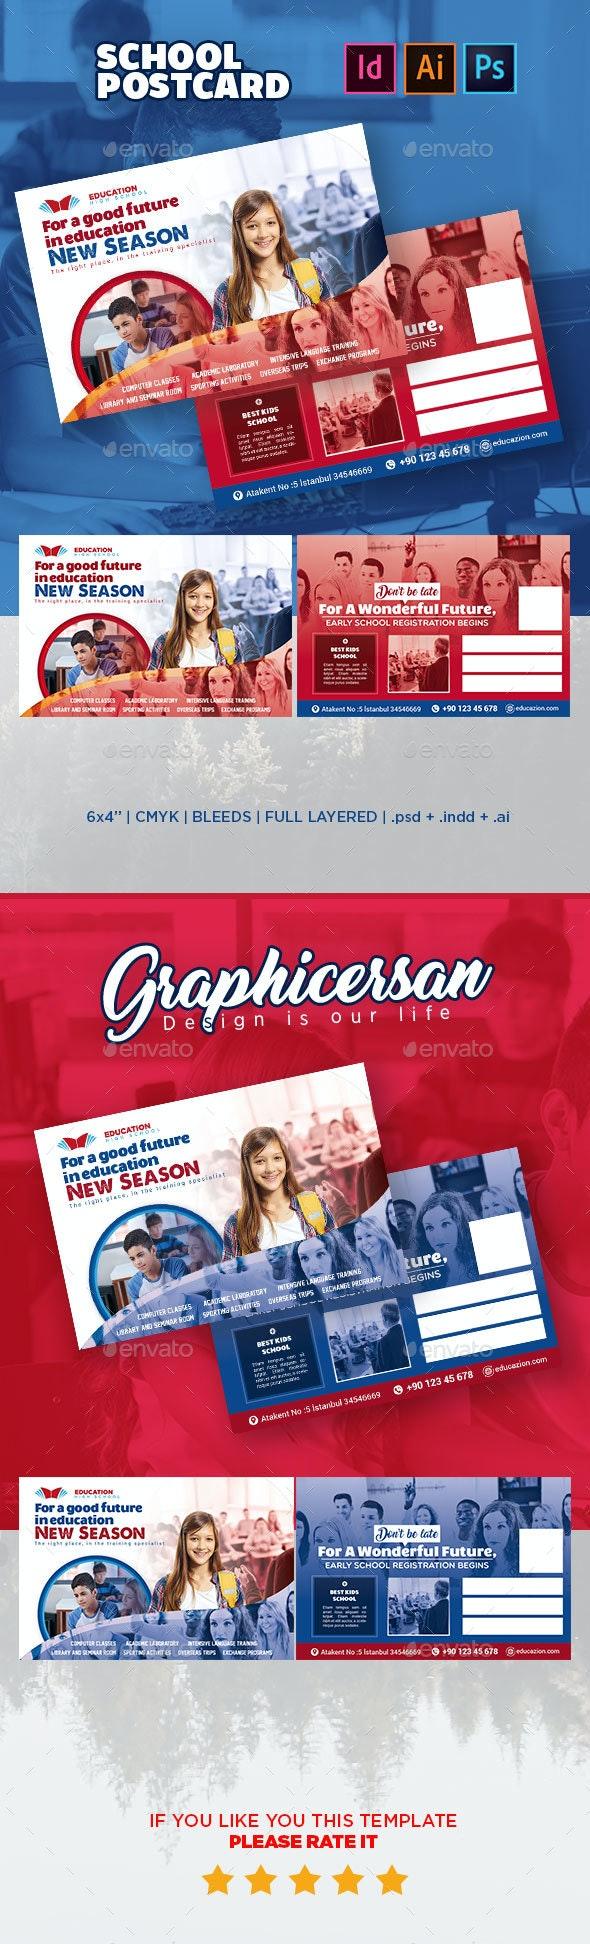 School Postcard Templates - Signage Print Templates